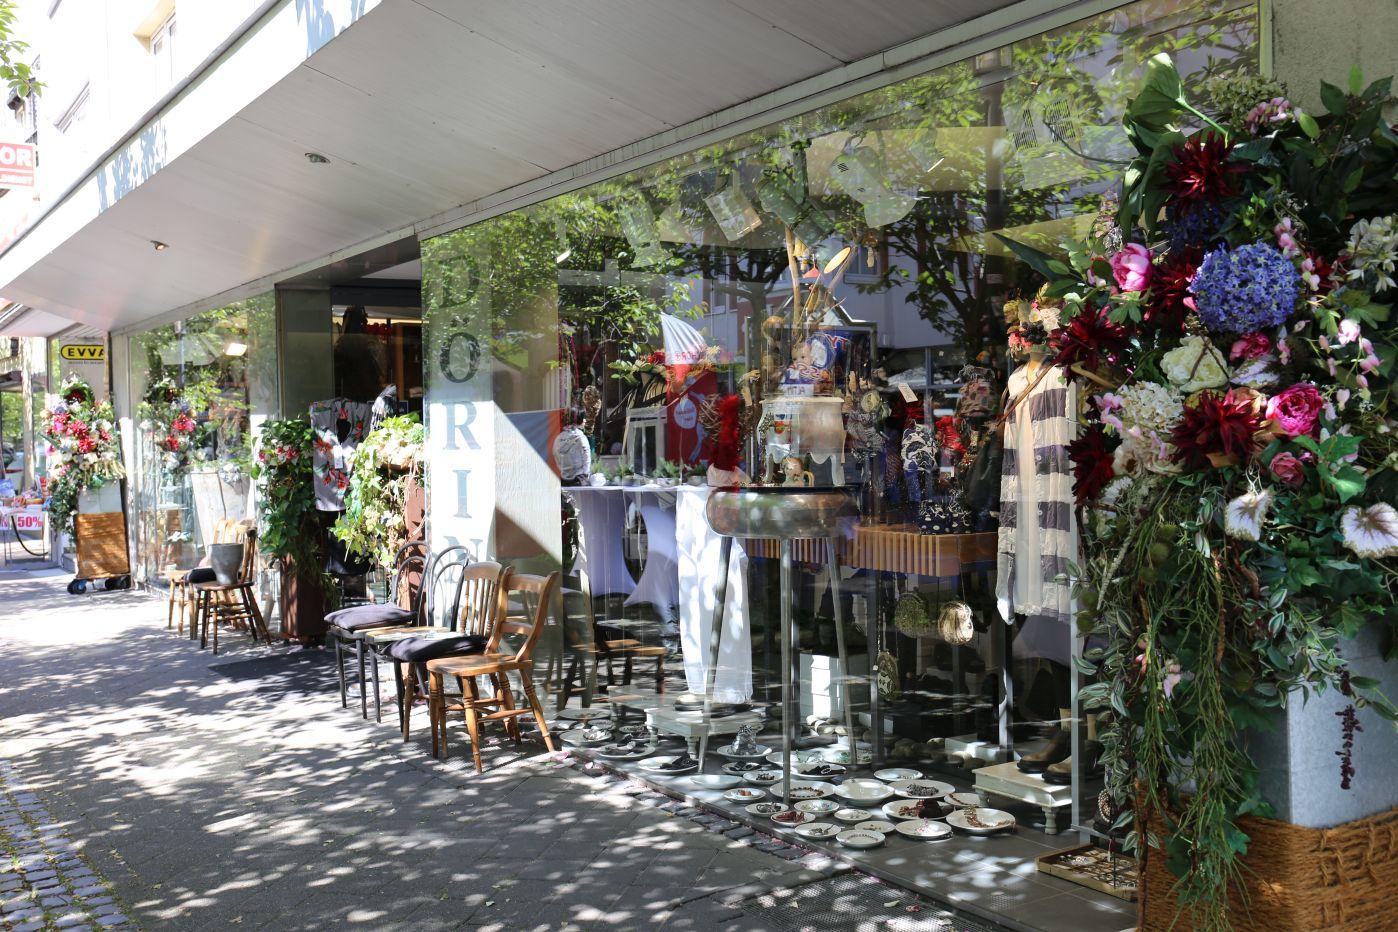 Doering boutique(43)